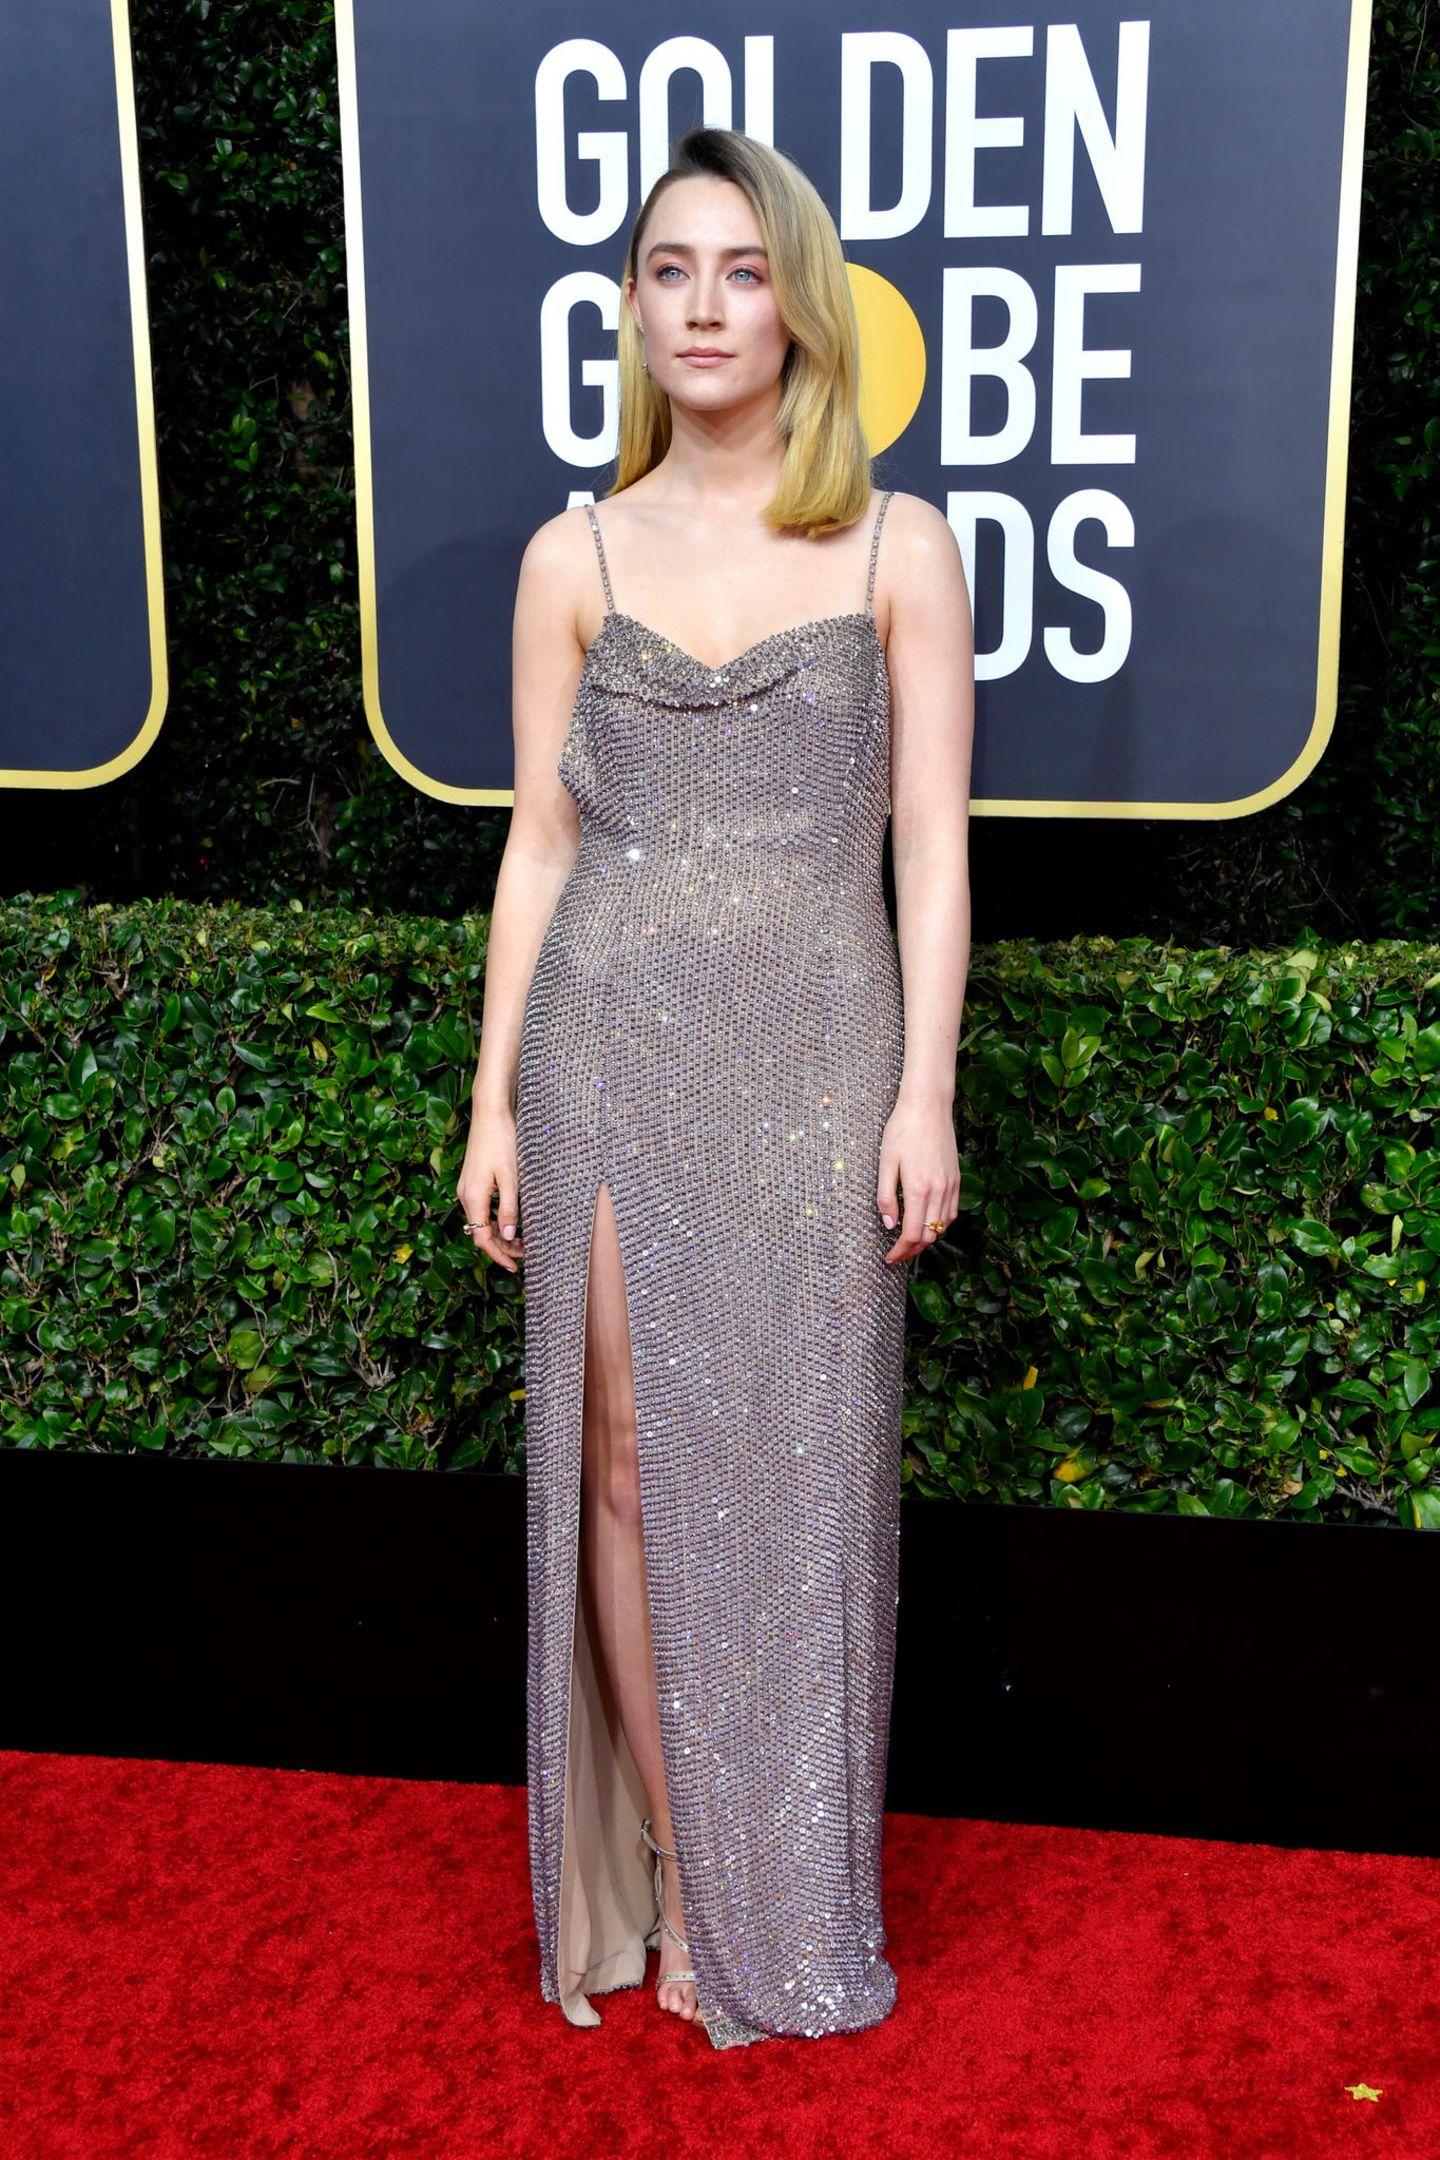 Golden Globes 2020: Saoirse Ronan